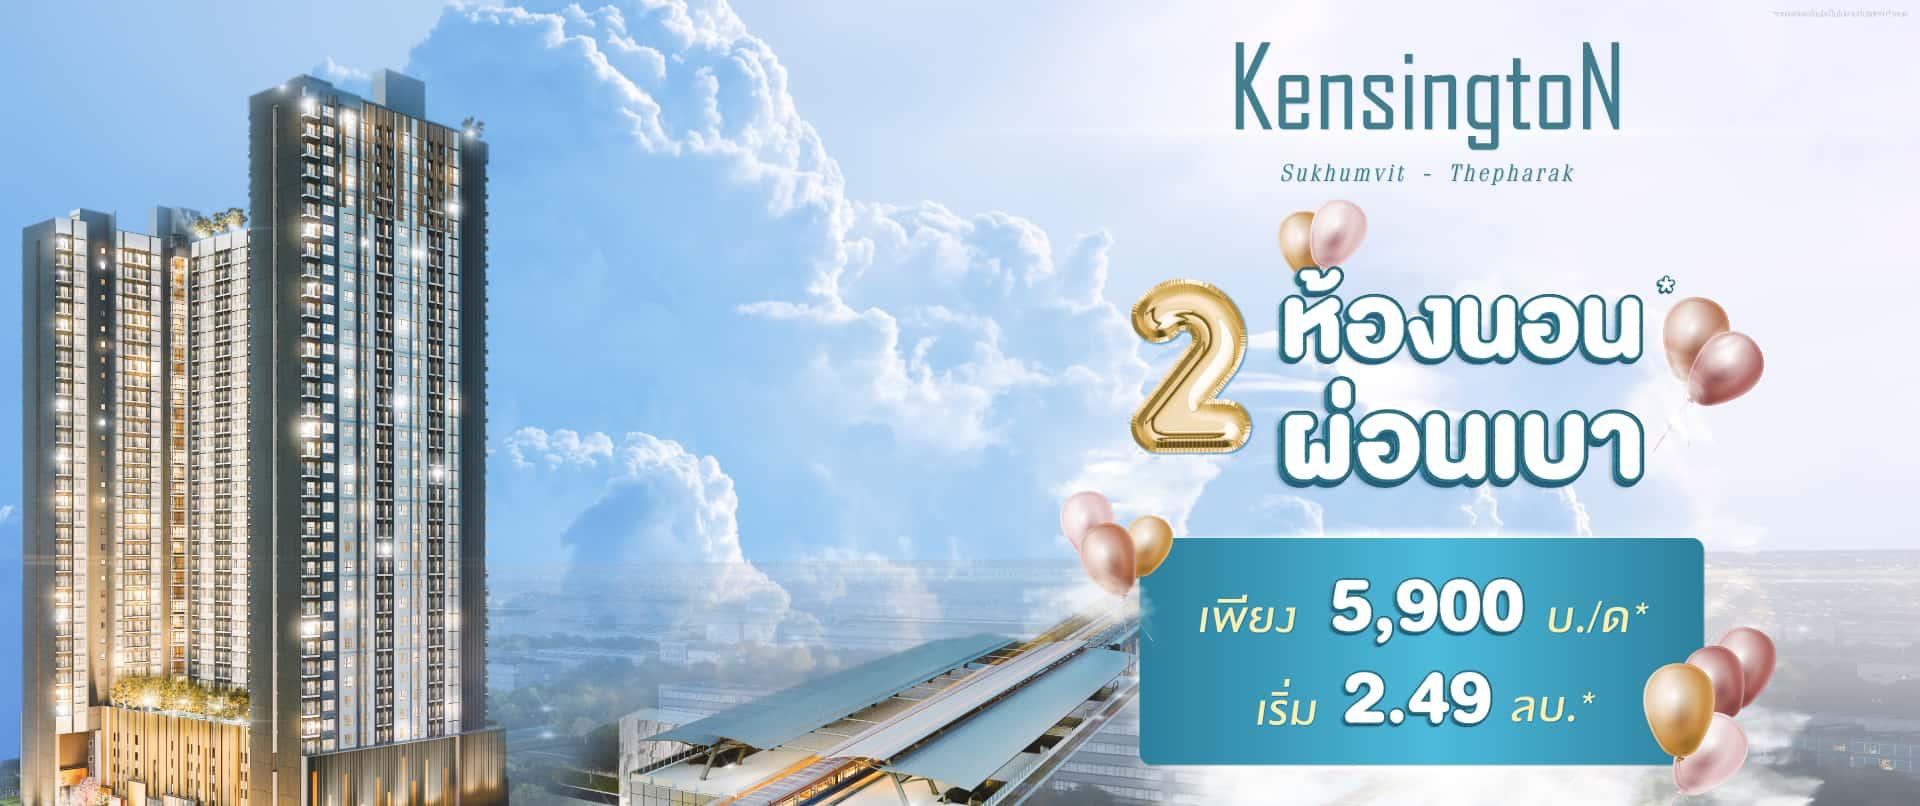 ken1920x806px (1)